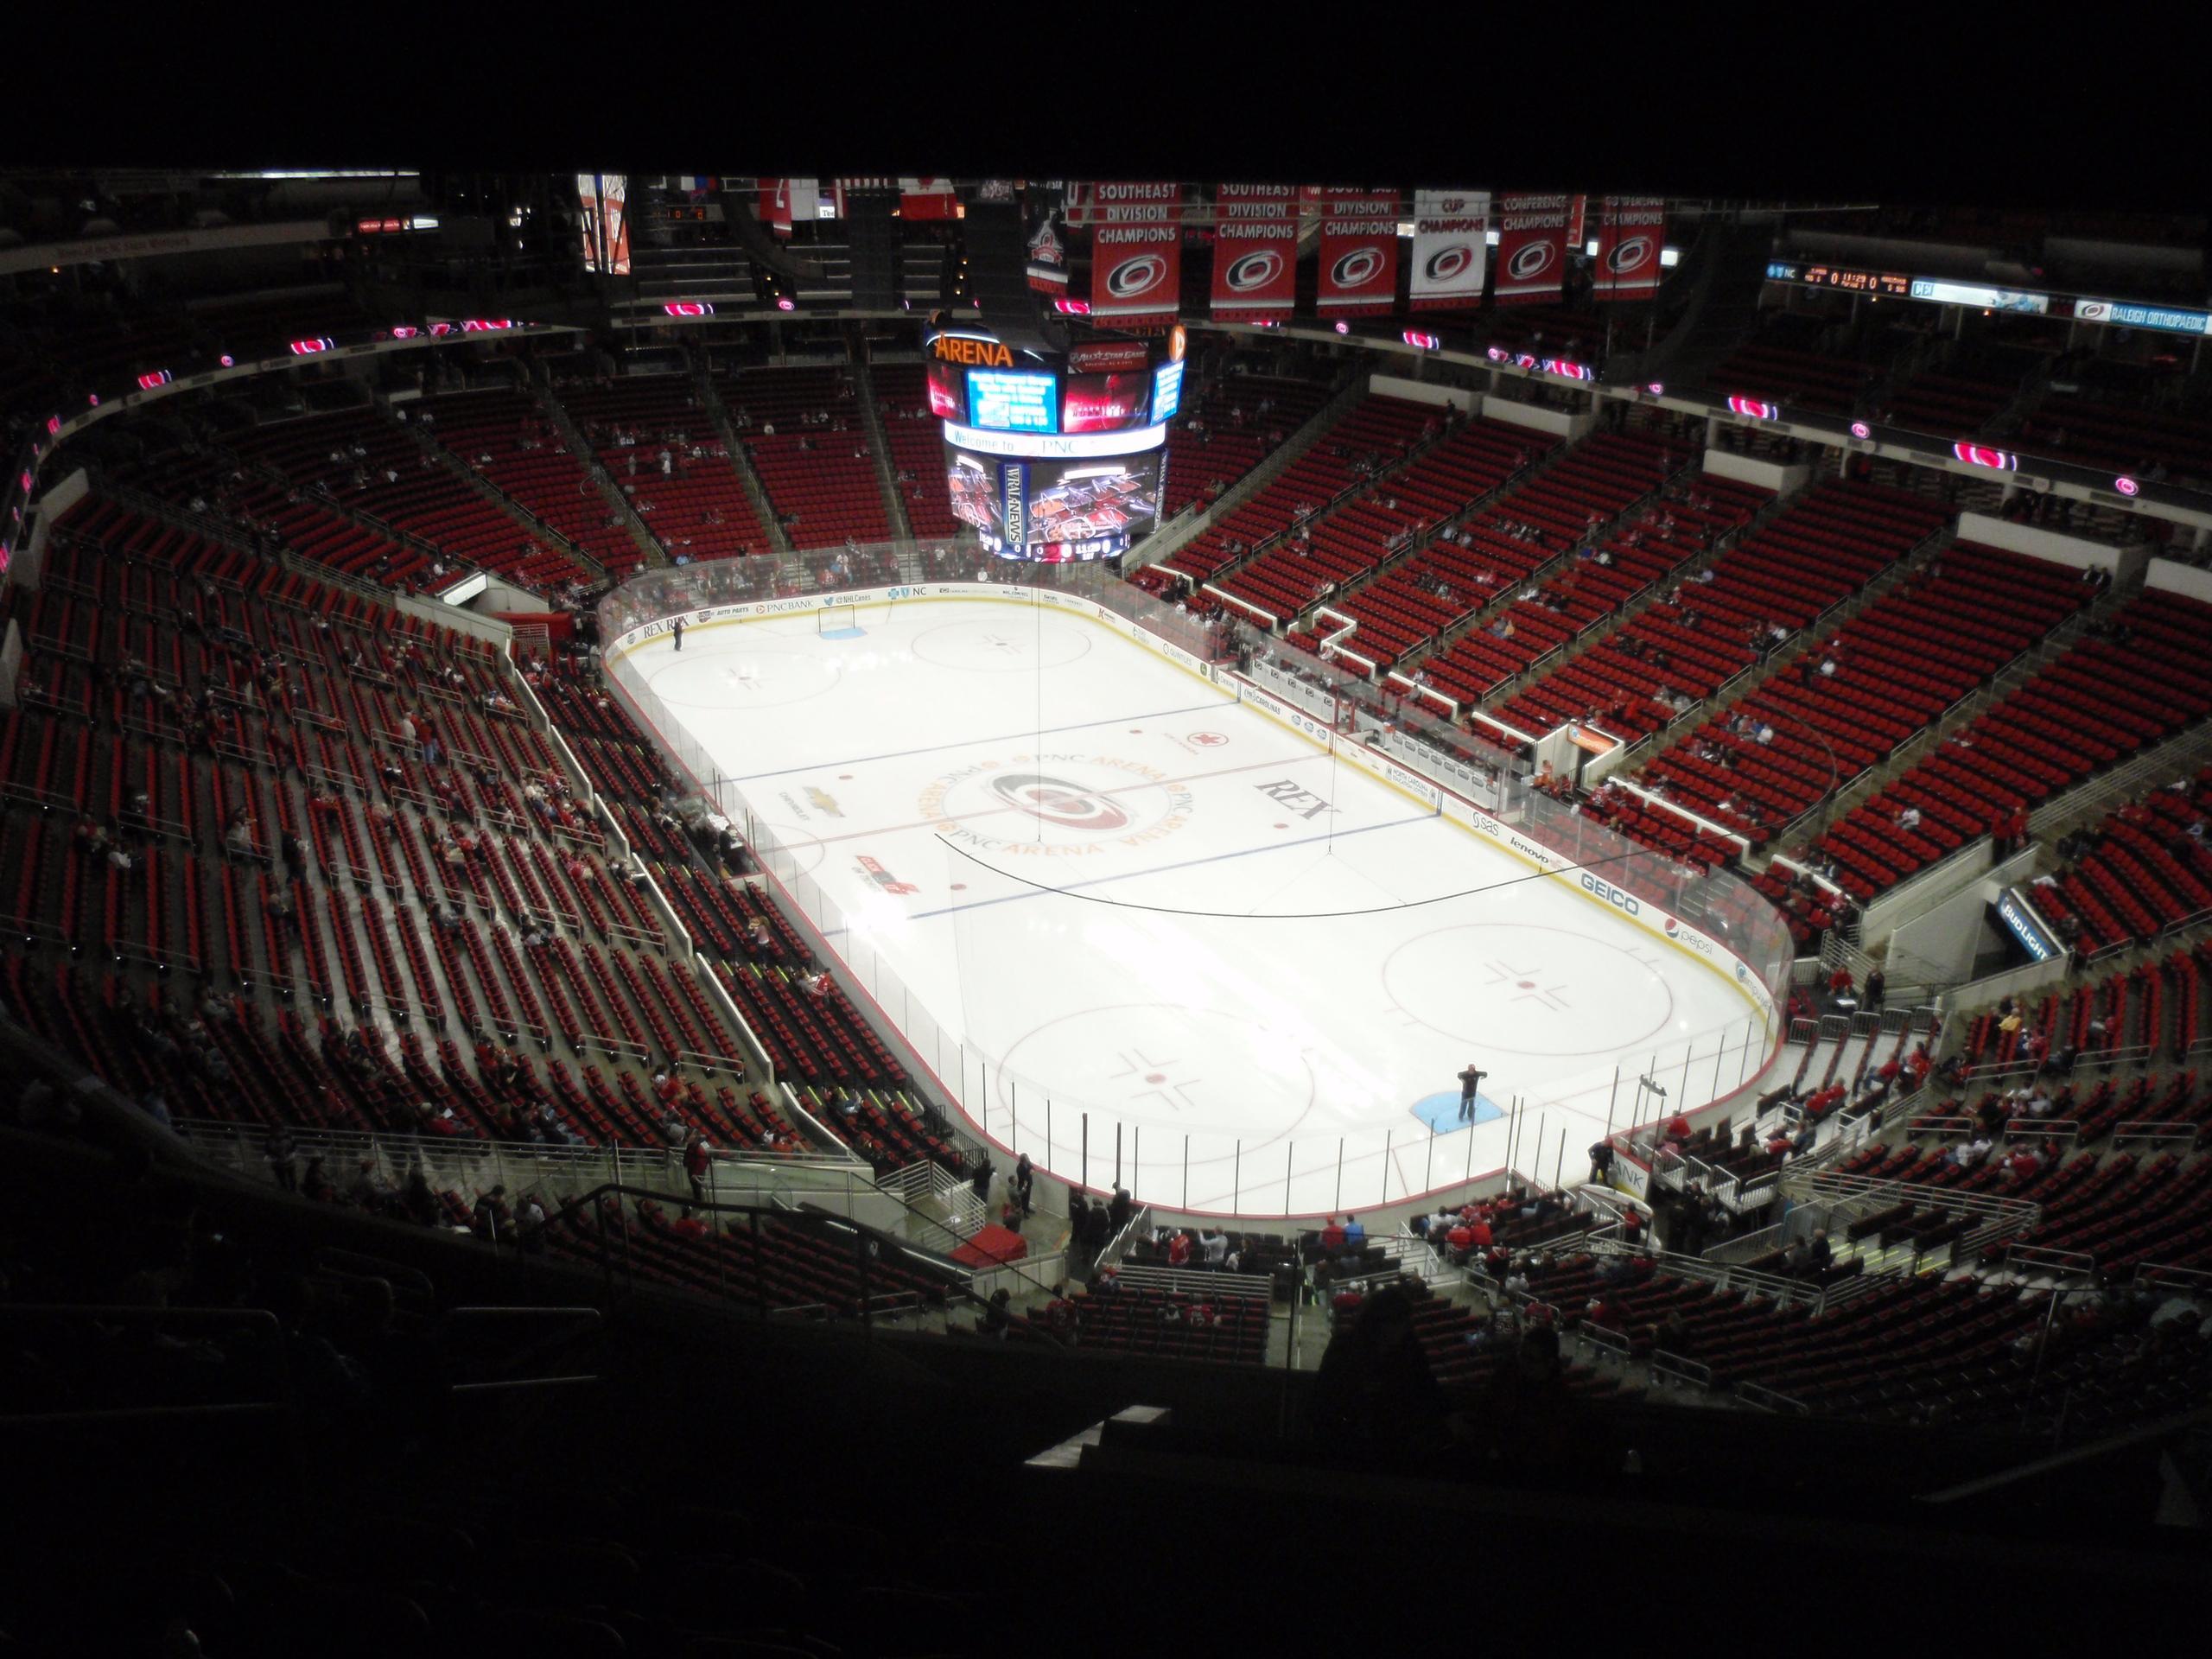 Pnc Arena Section 317 Carolina Hurricanes